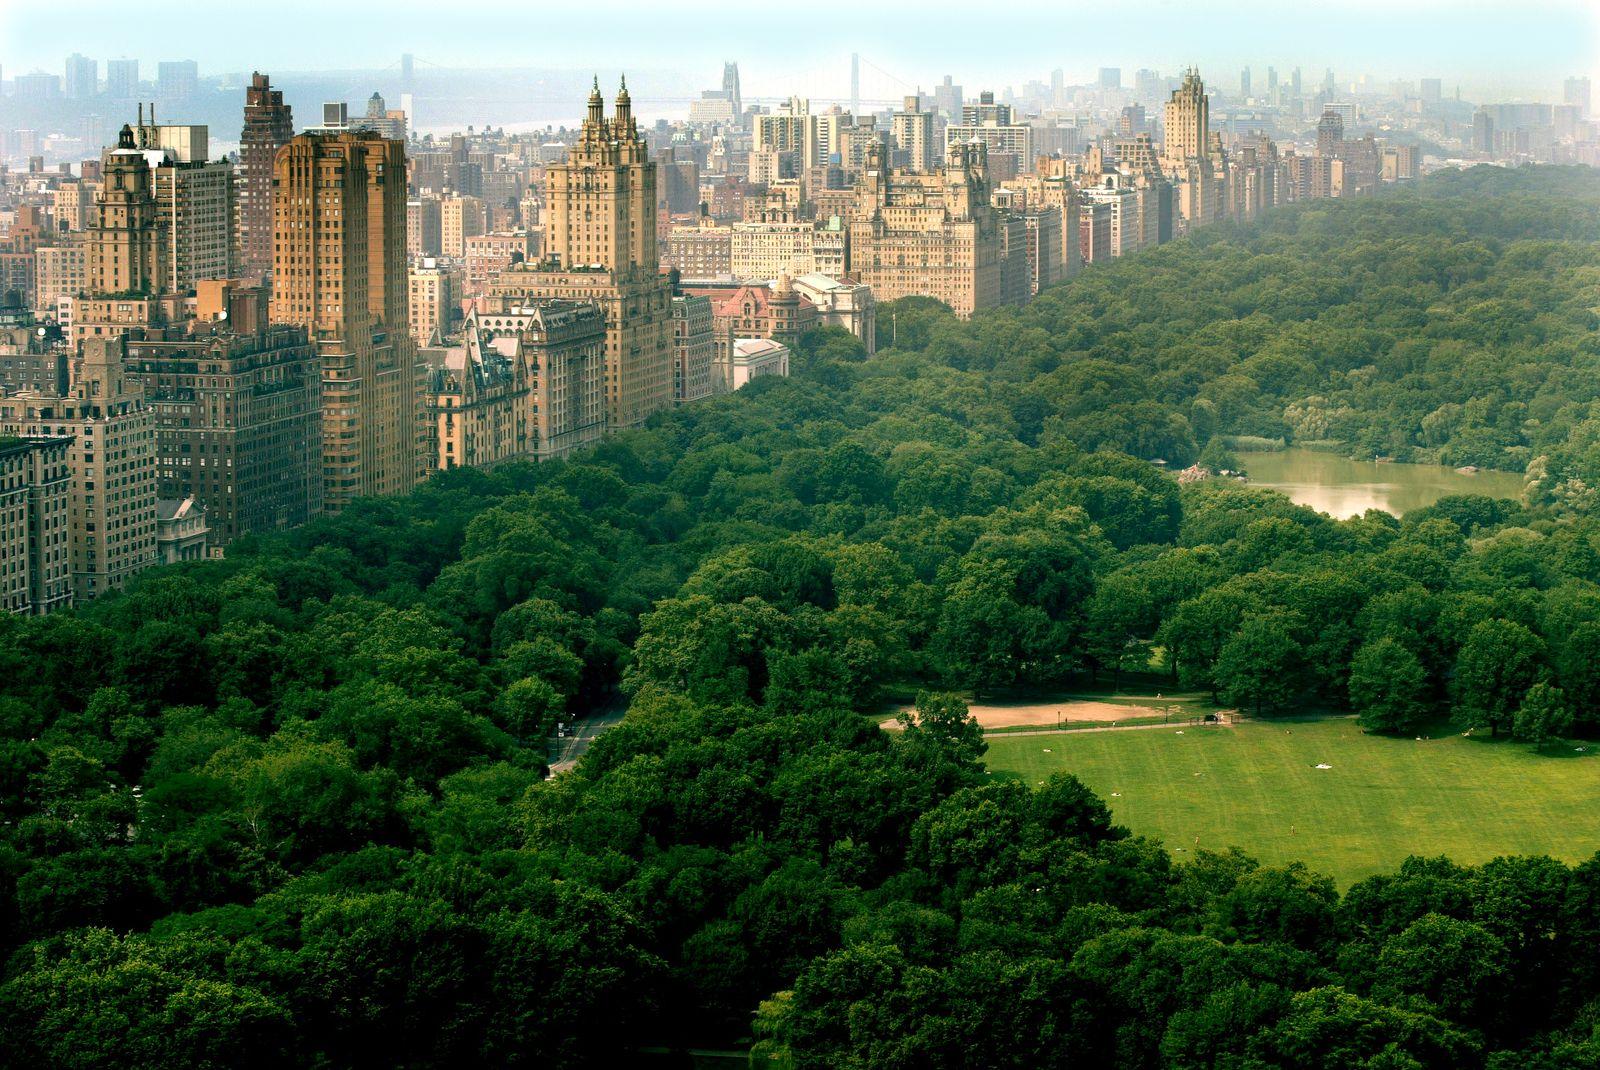 New York / Central Park